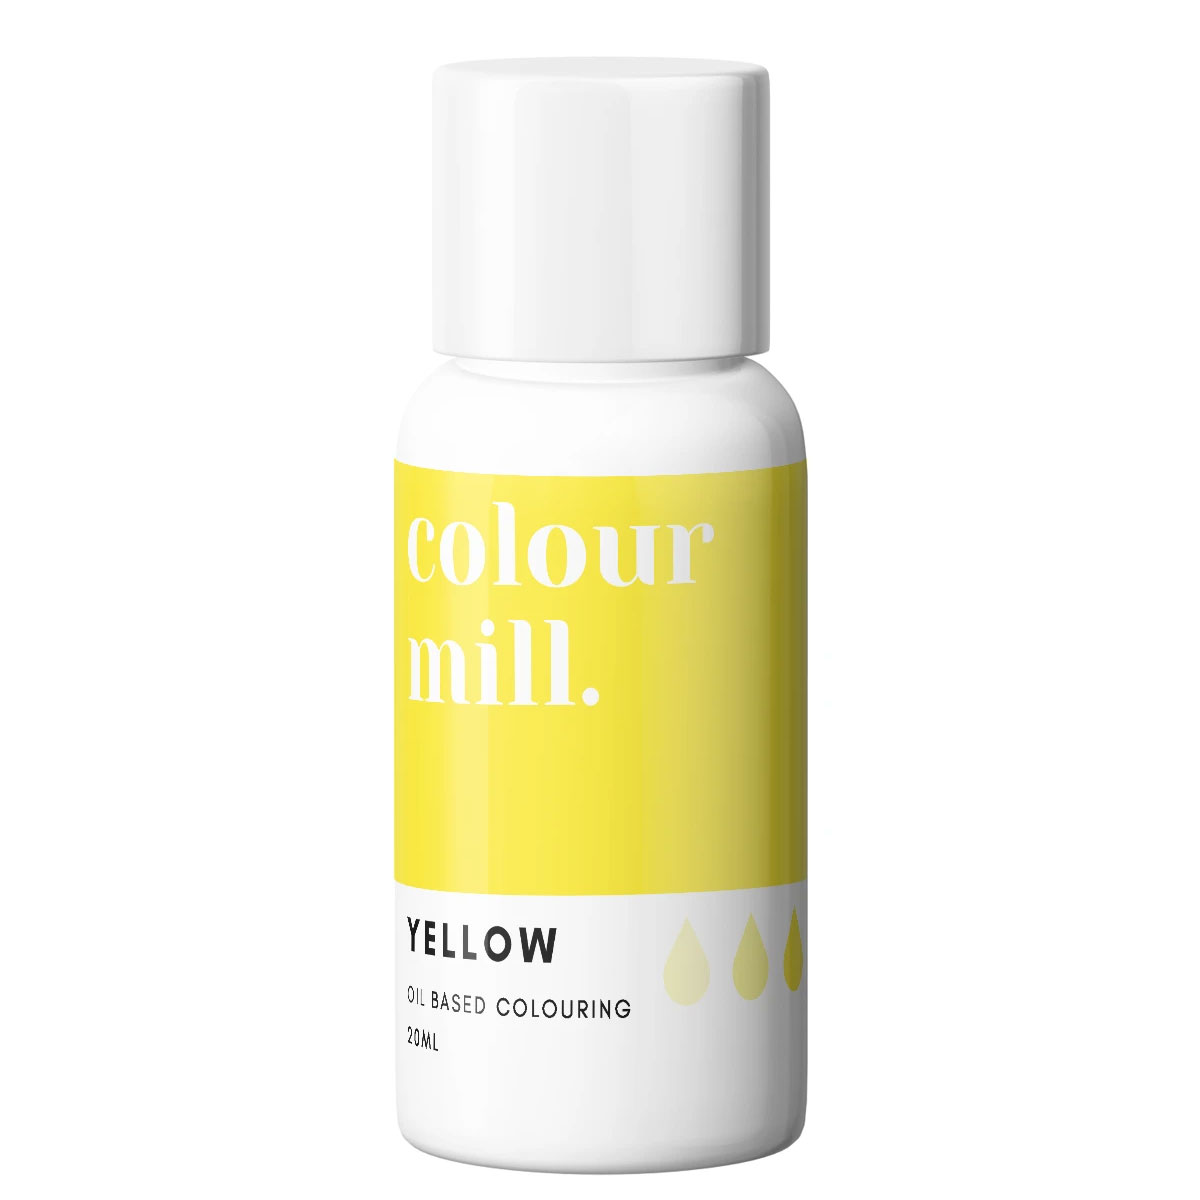 Colour Mill fettlösliche Lebensmittelfarbe - Yellow 20ml